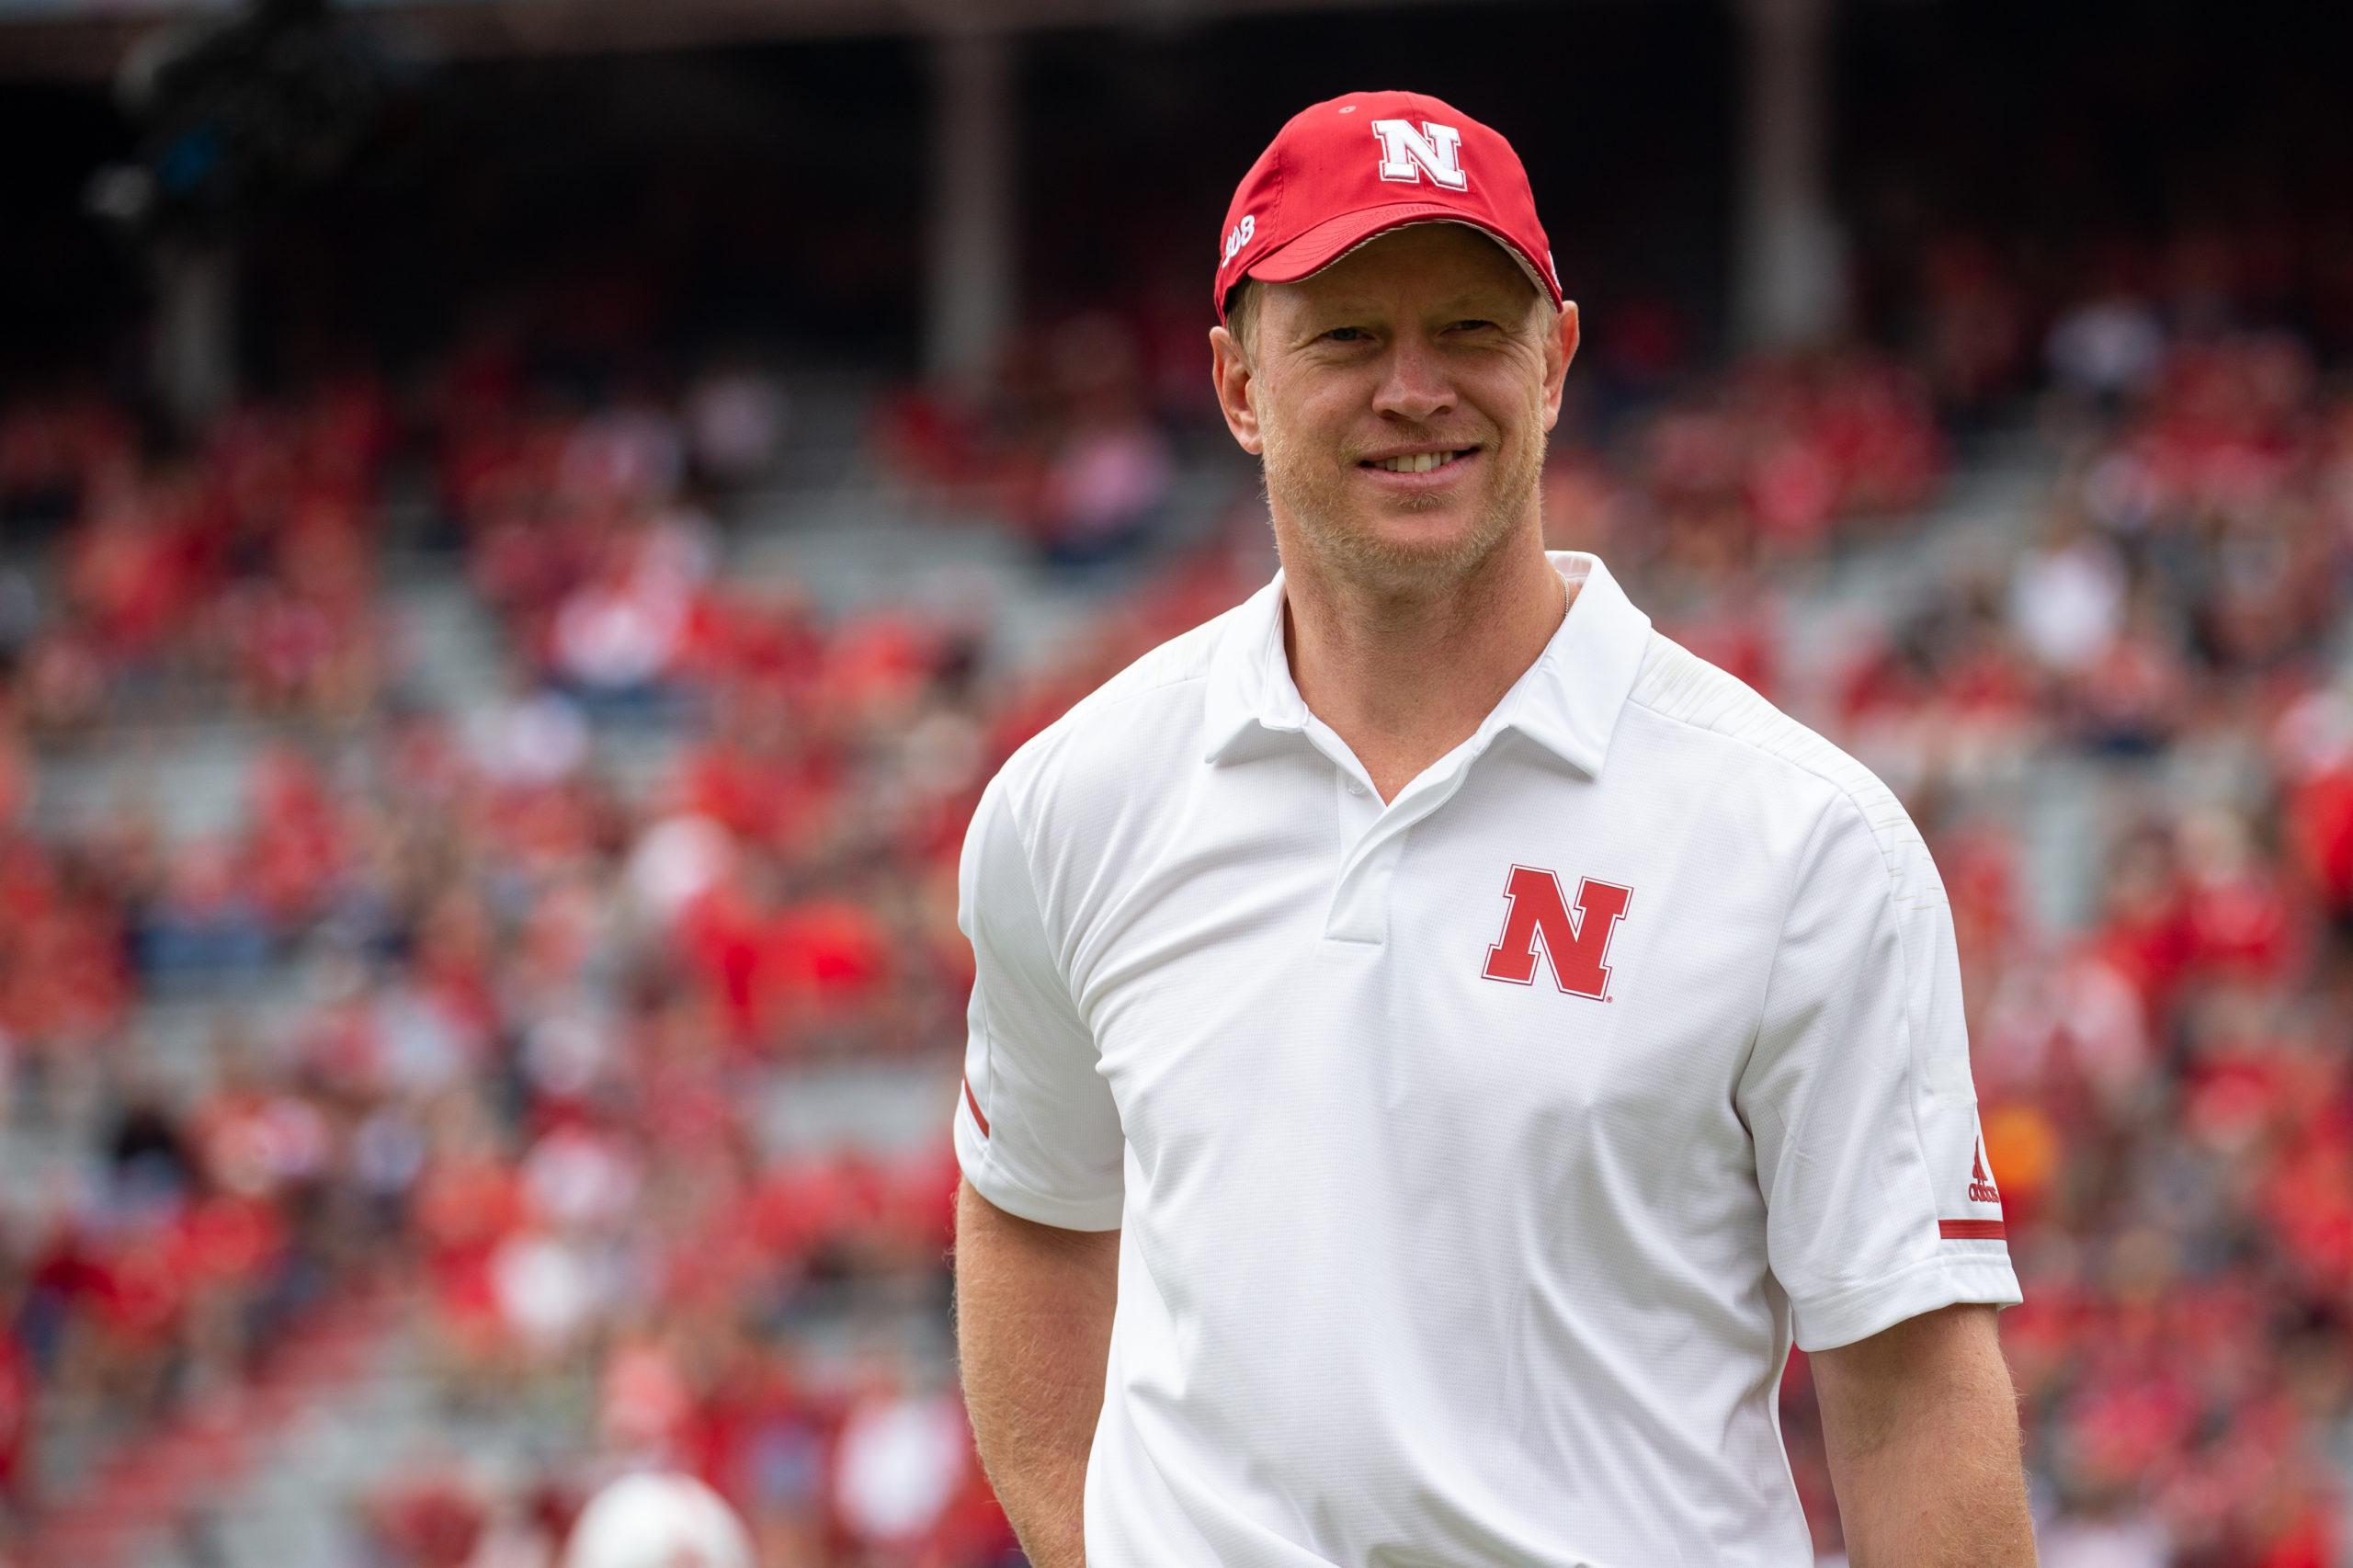 Nebraska Football Head Coach Scott Frost on sideline of game against the University of Colorado in 2018.